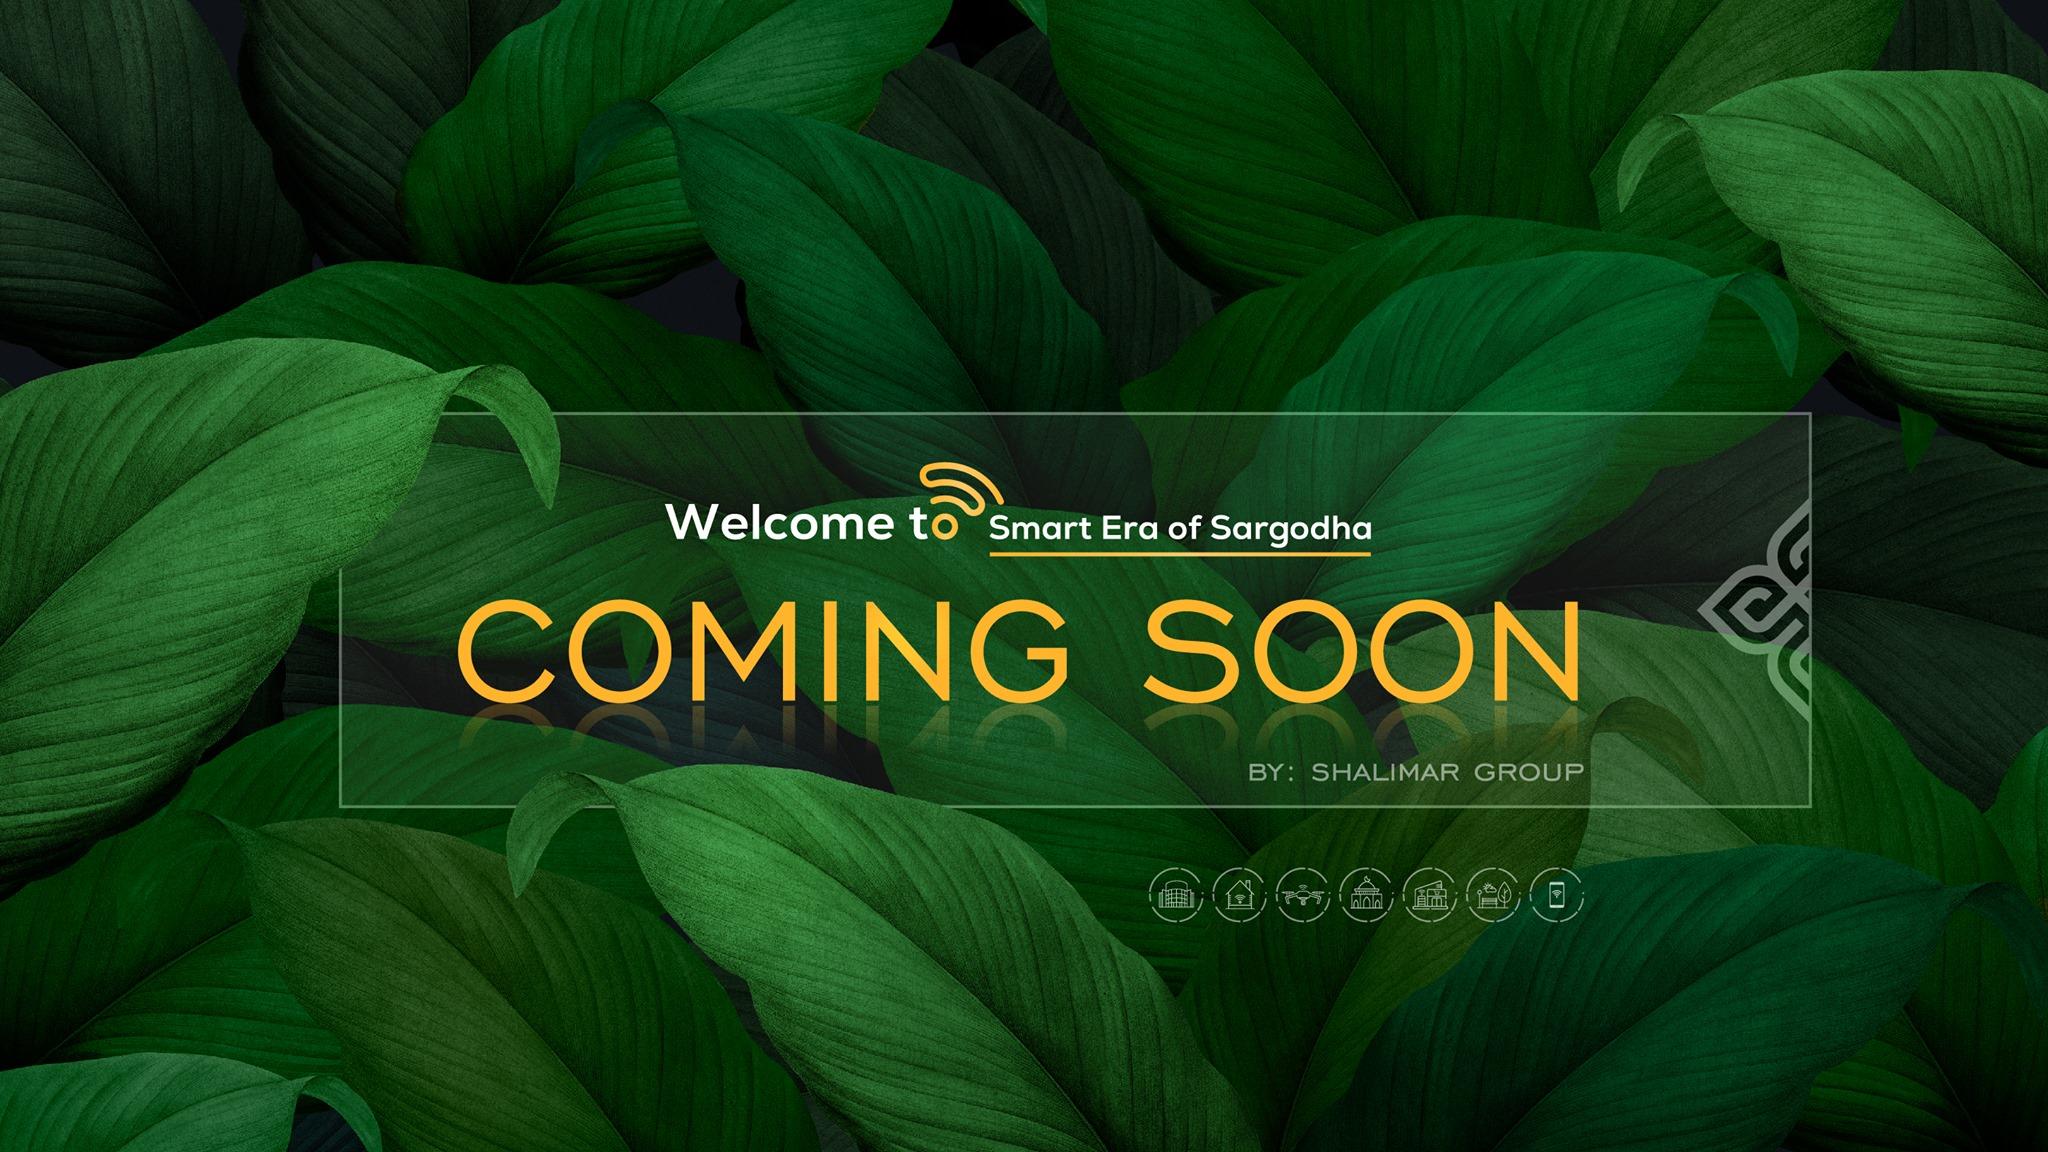 Shalimar Smart City Sargodha - Dreams Marketing